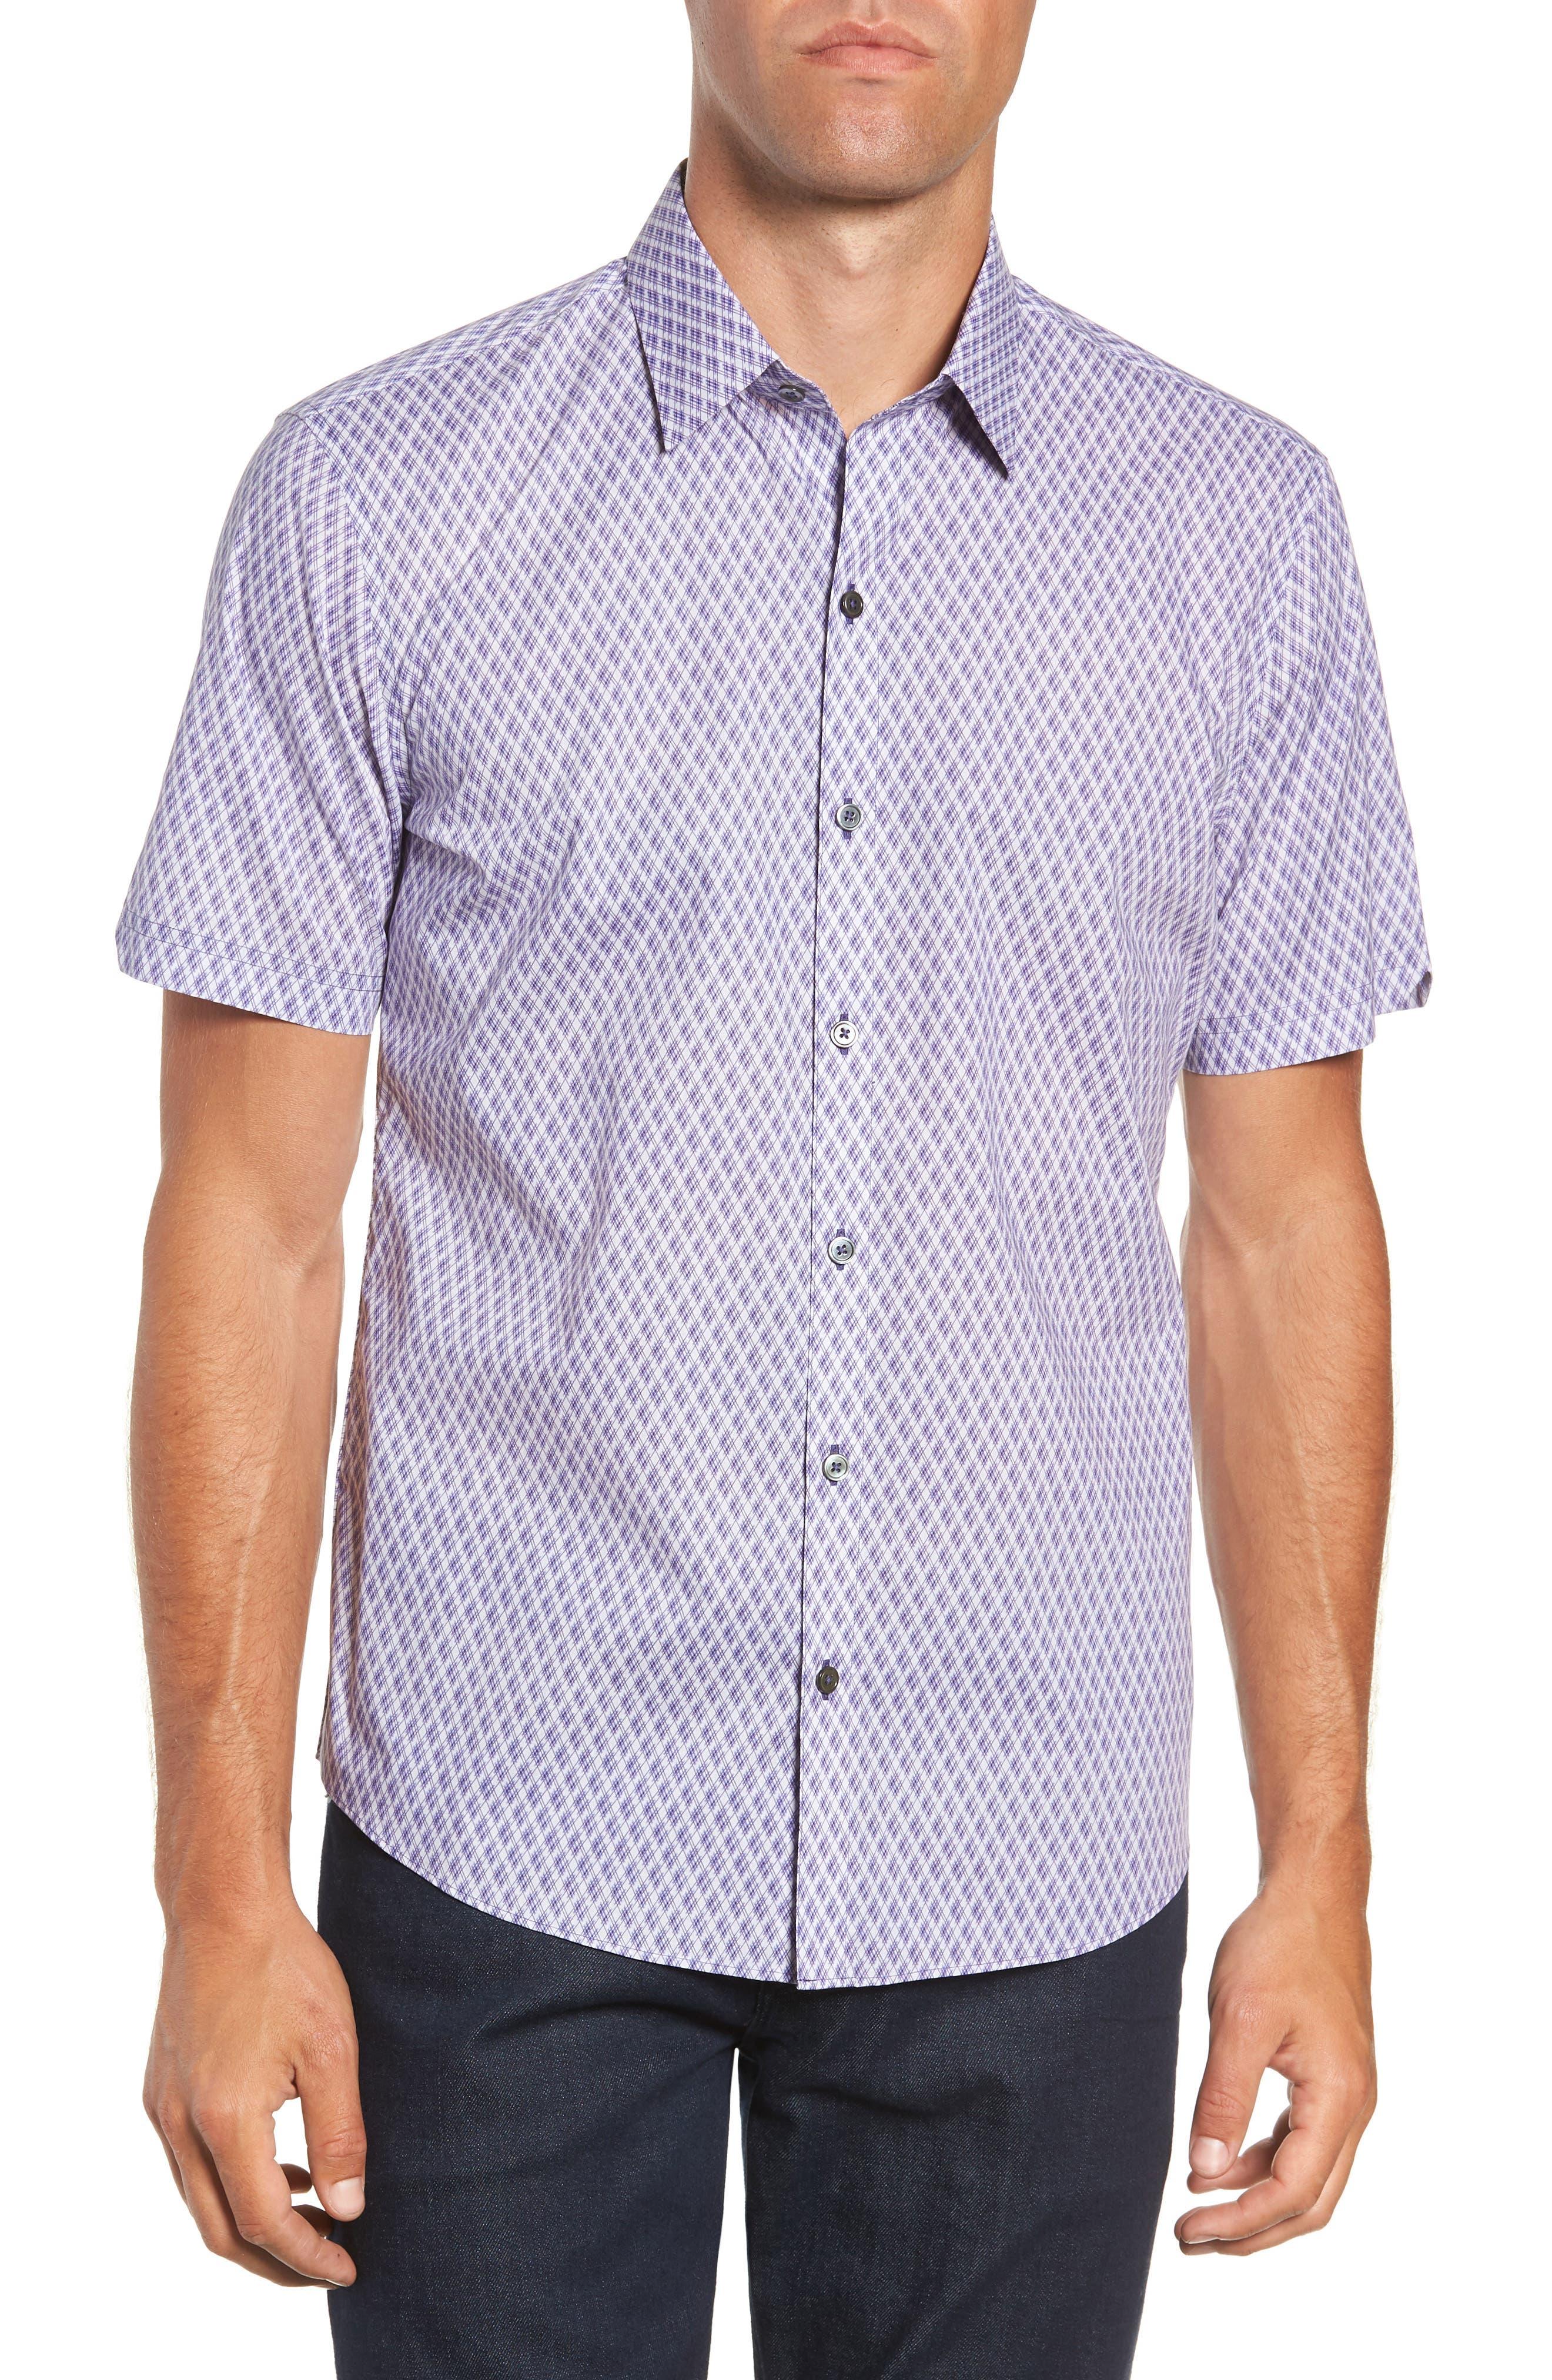 Madorin Regular Fit Sport Shirt,                             Main thumbnail 1, color,                             PURPLE